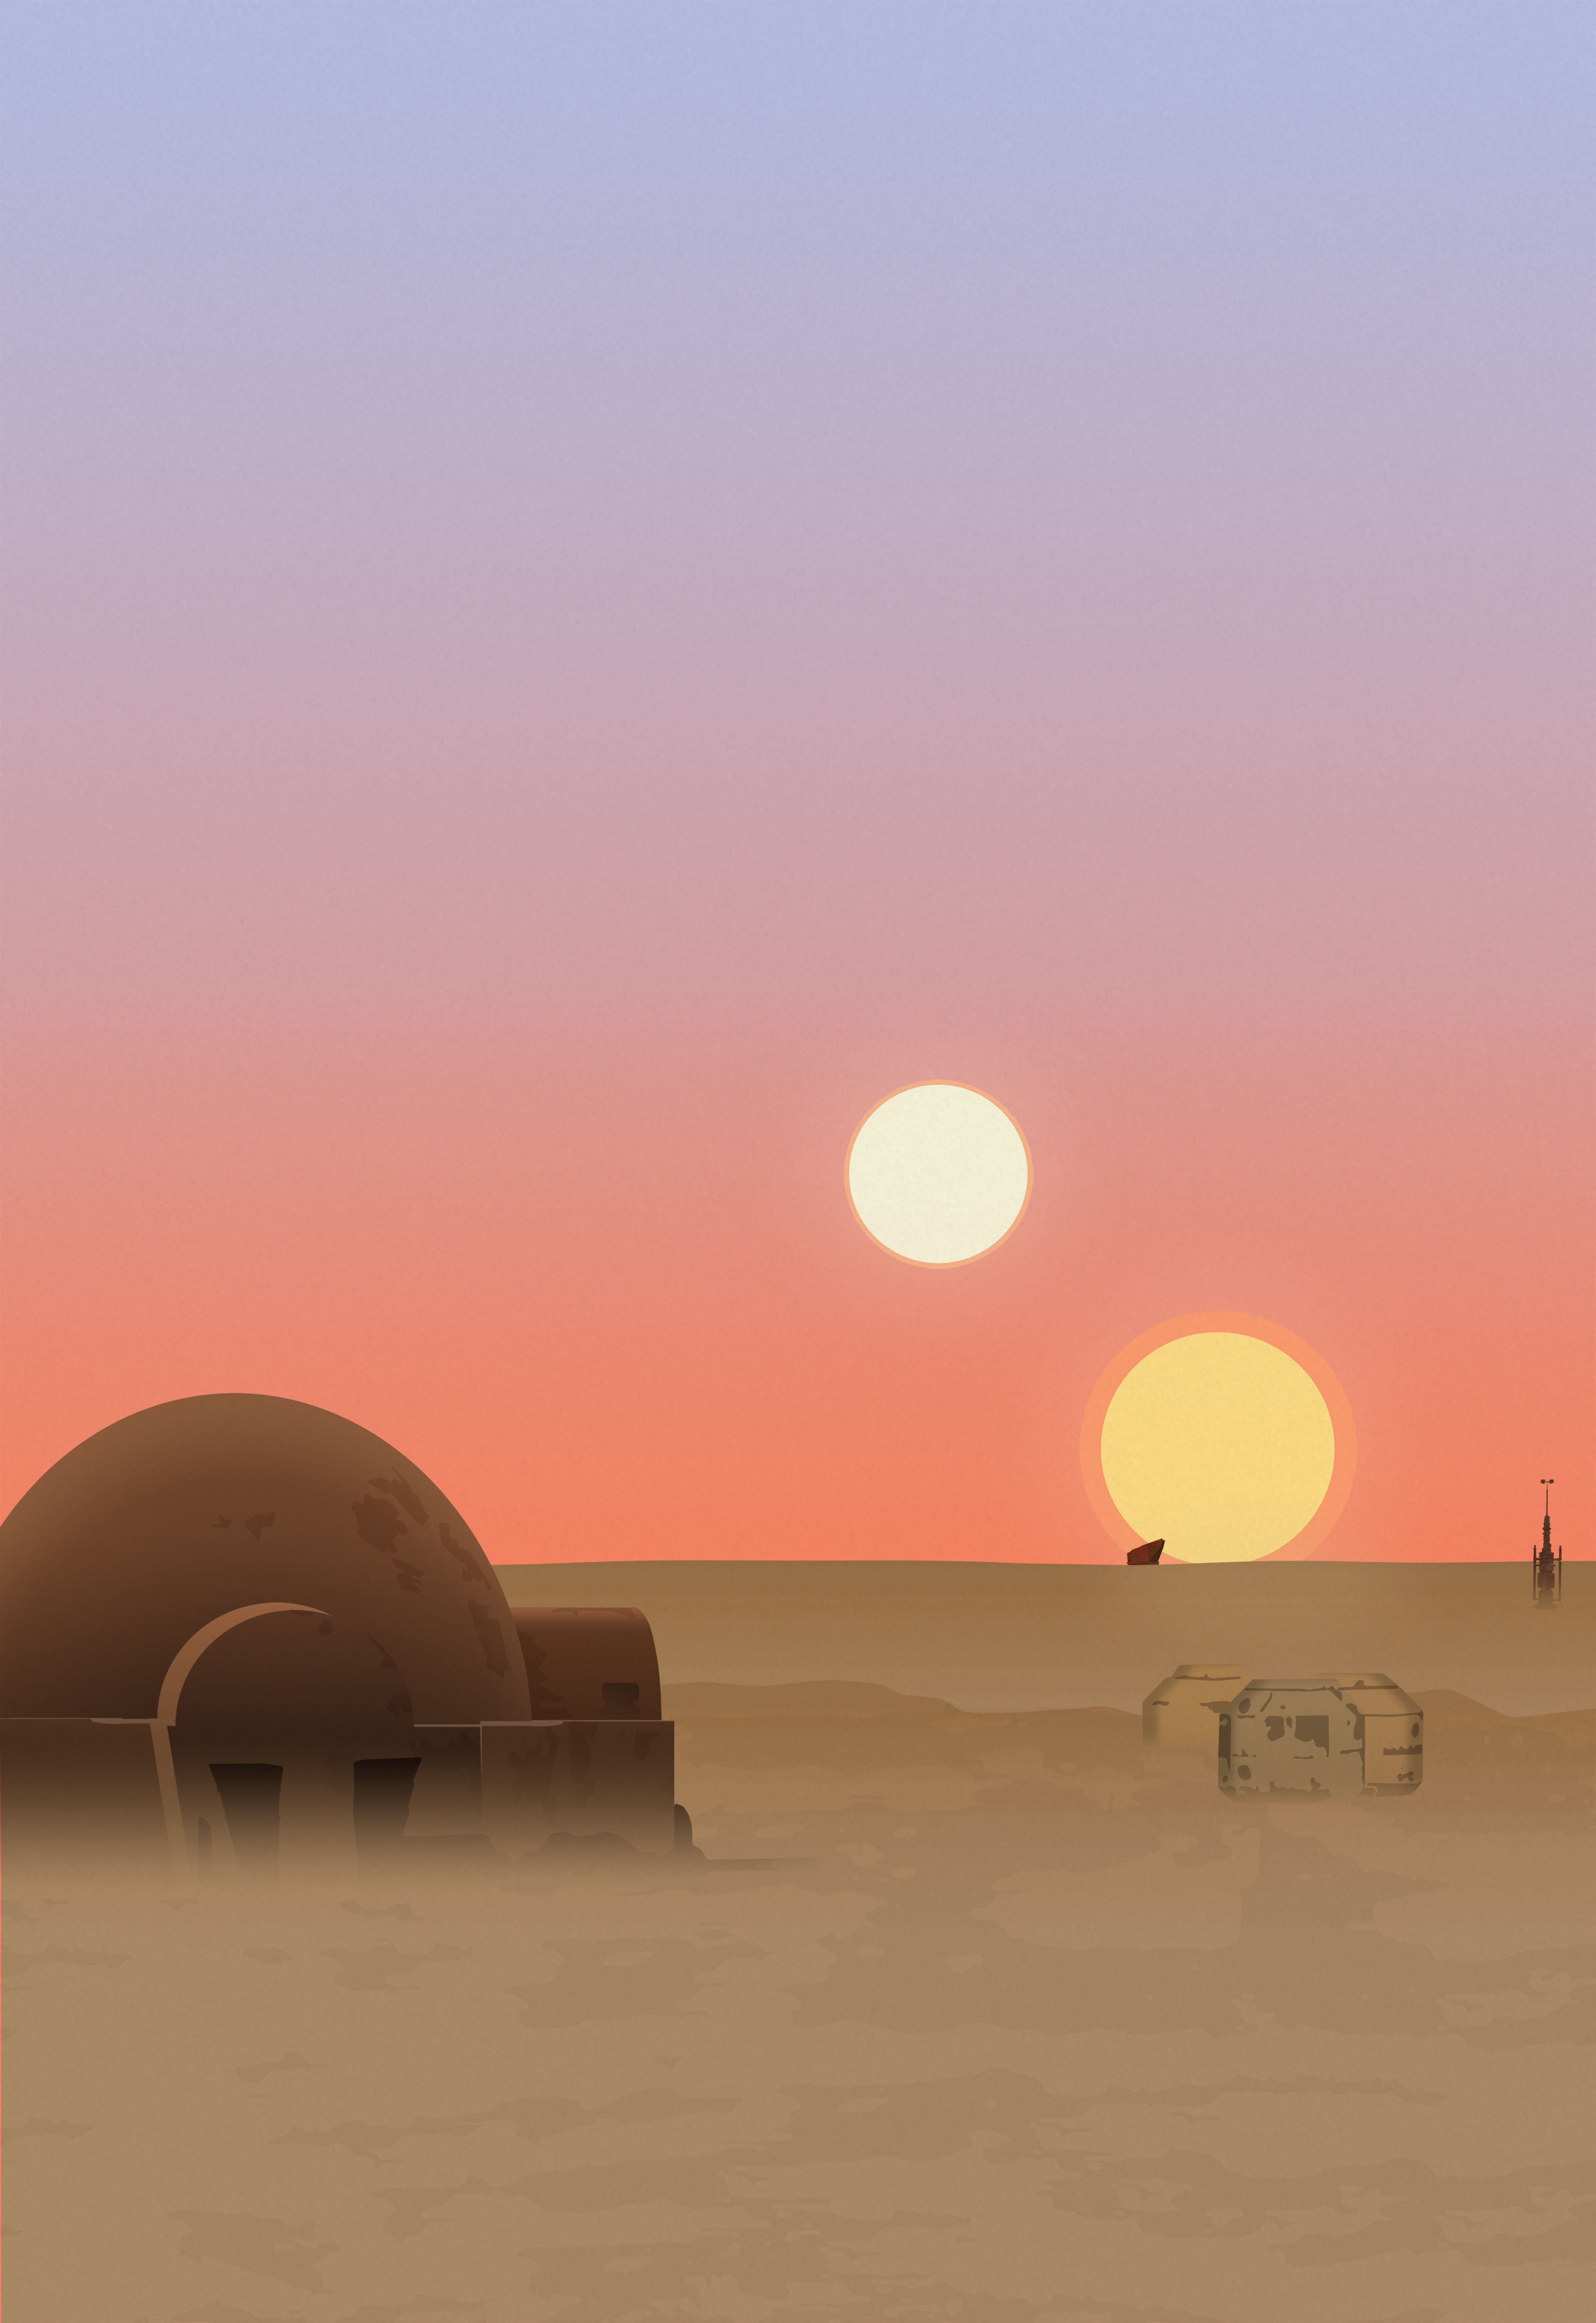 Star Wars Landscape Wallpaper Star Wars Painting Star Wars Background Star Wars Wallpaper